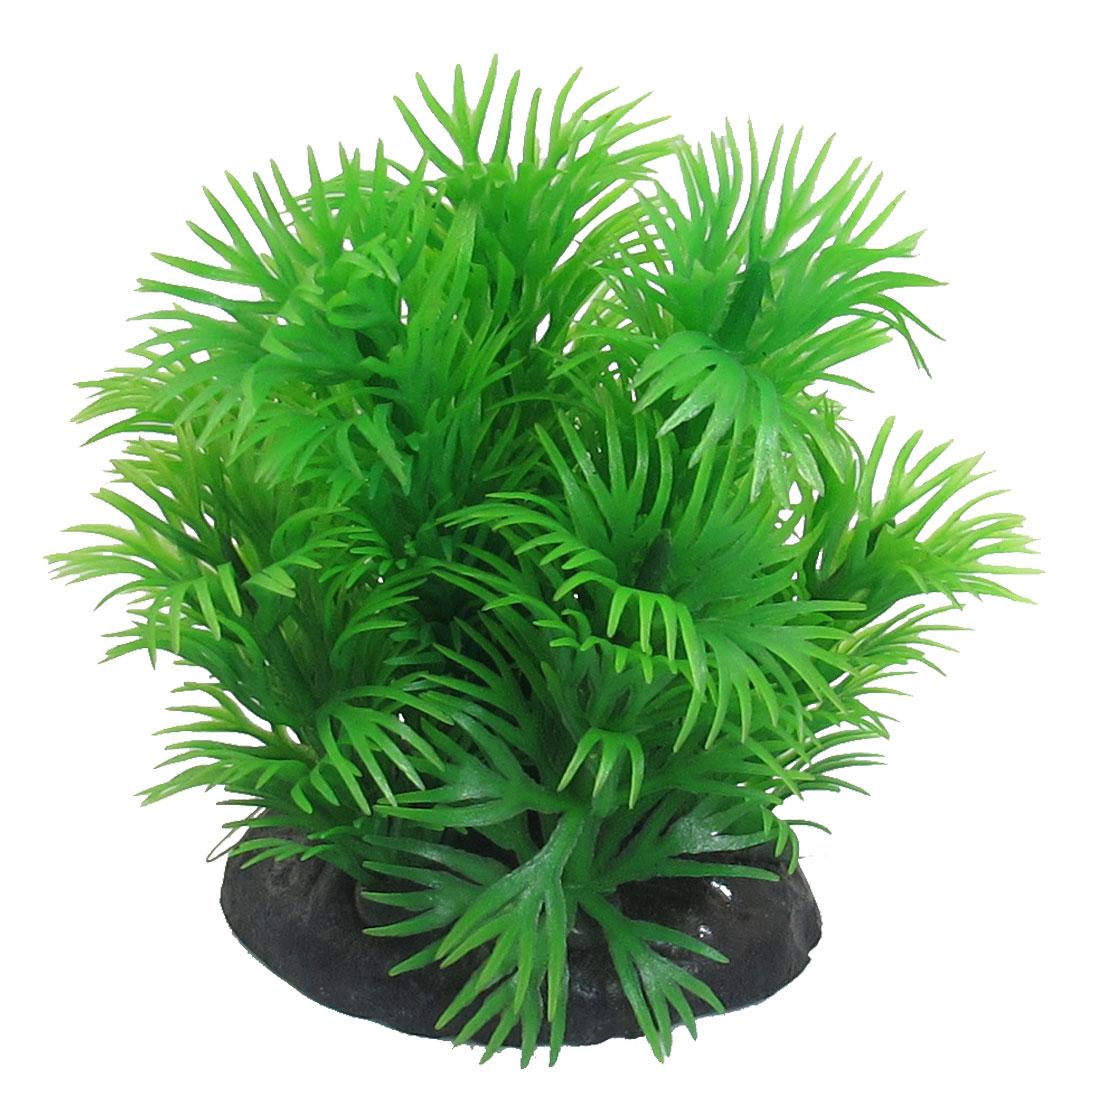 Aquarium Artificial Plastic Grass Plant Decoration Green 8cm